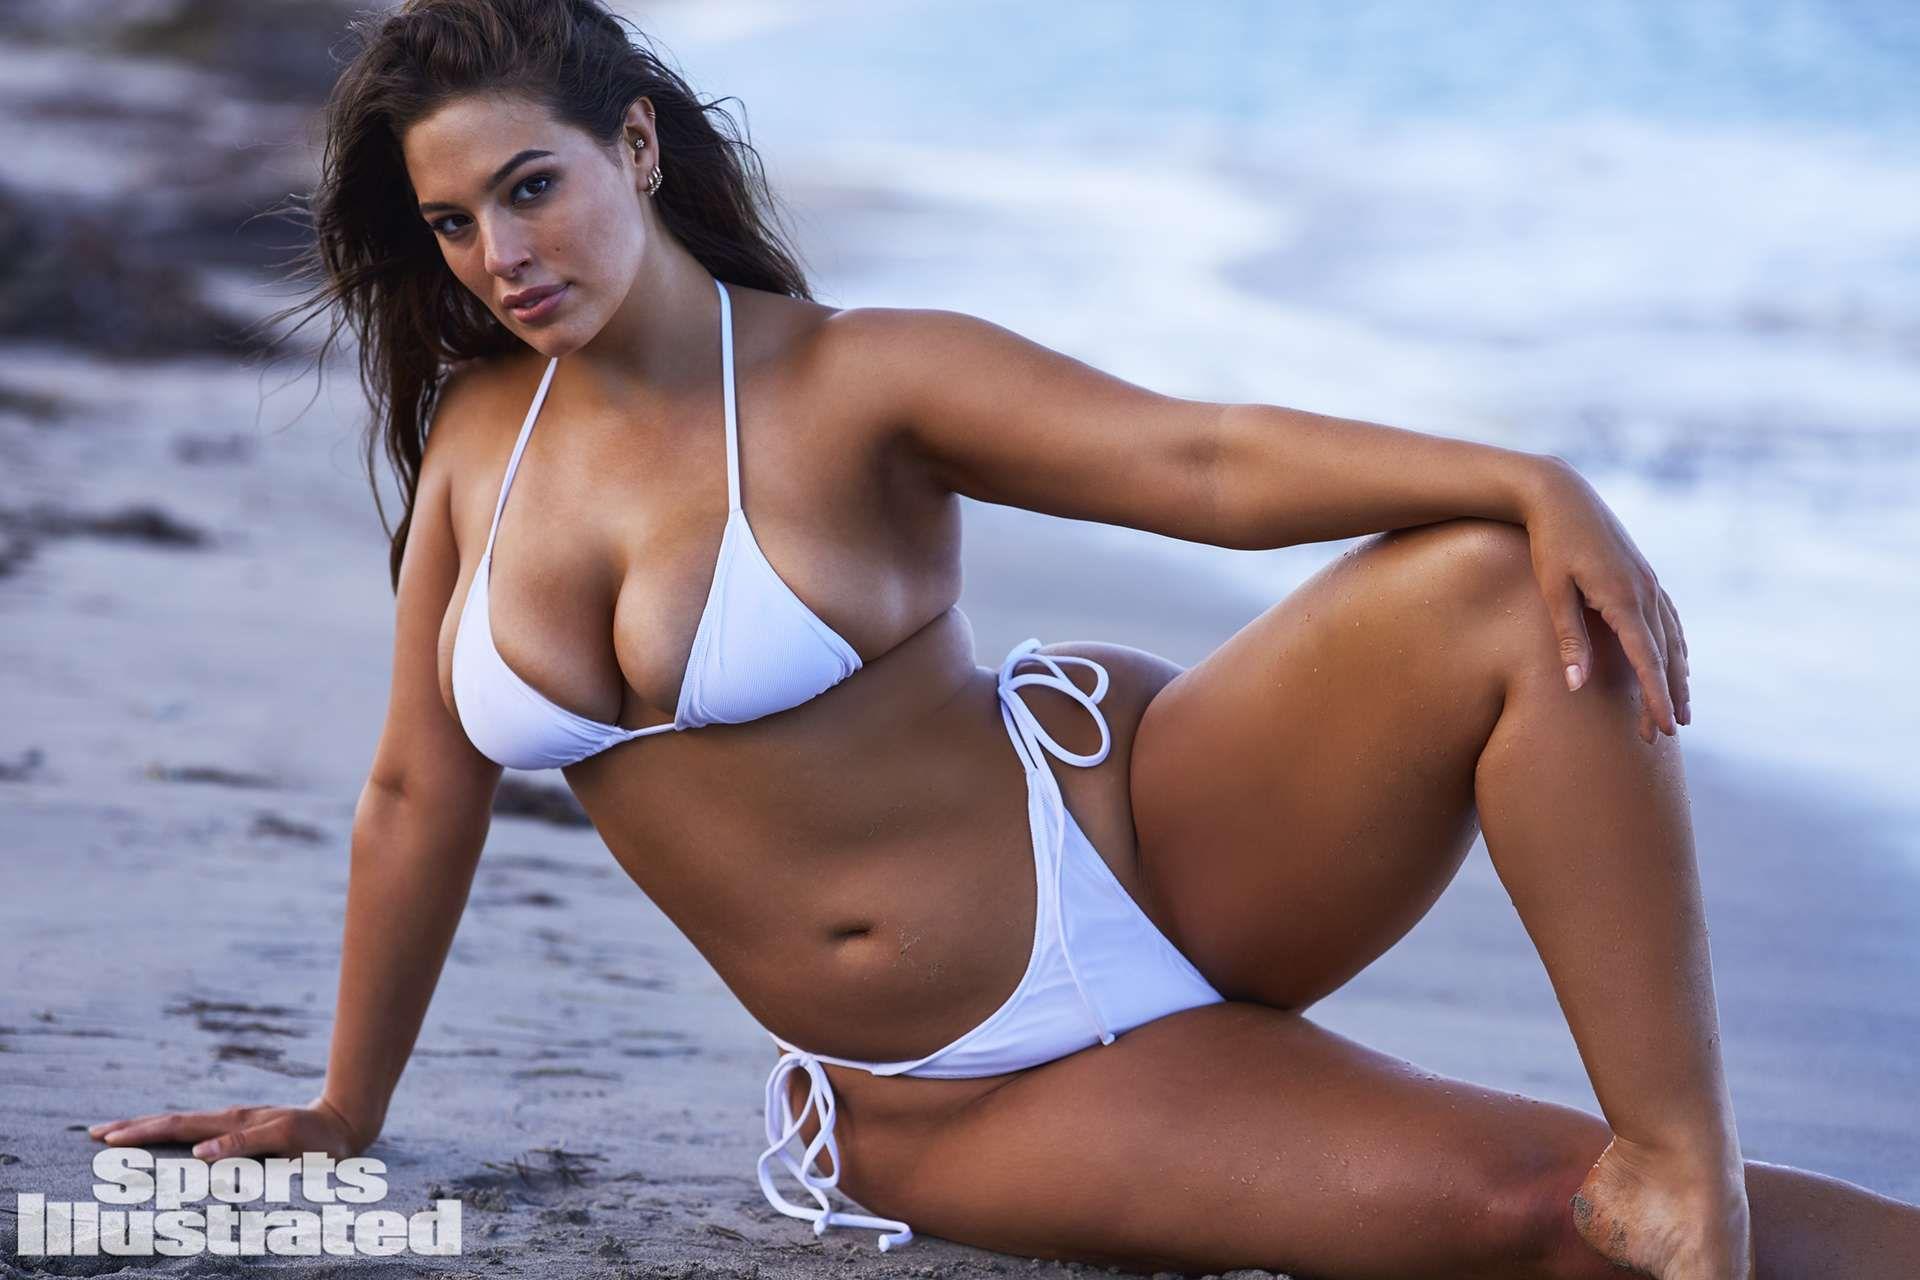 Allie Ayers Nude bikini celebrity (celebritybibkinifashion) on pinterest